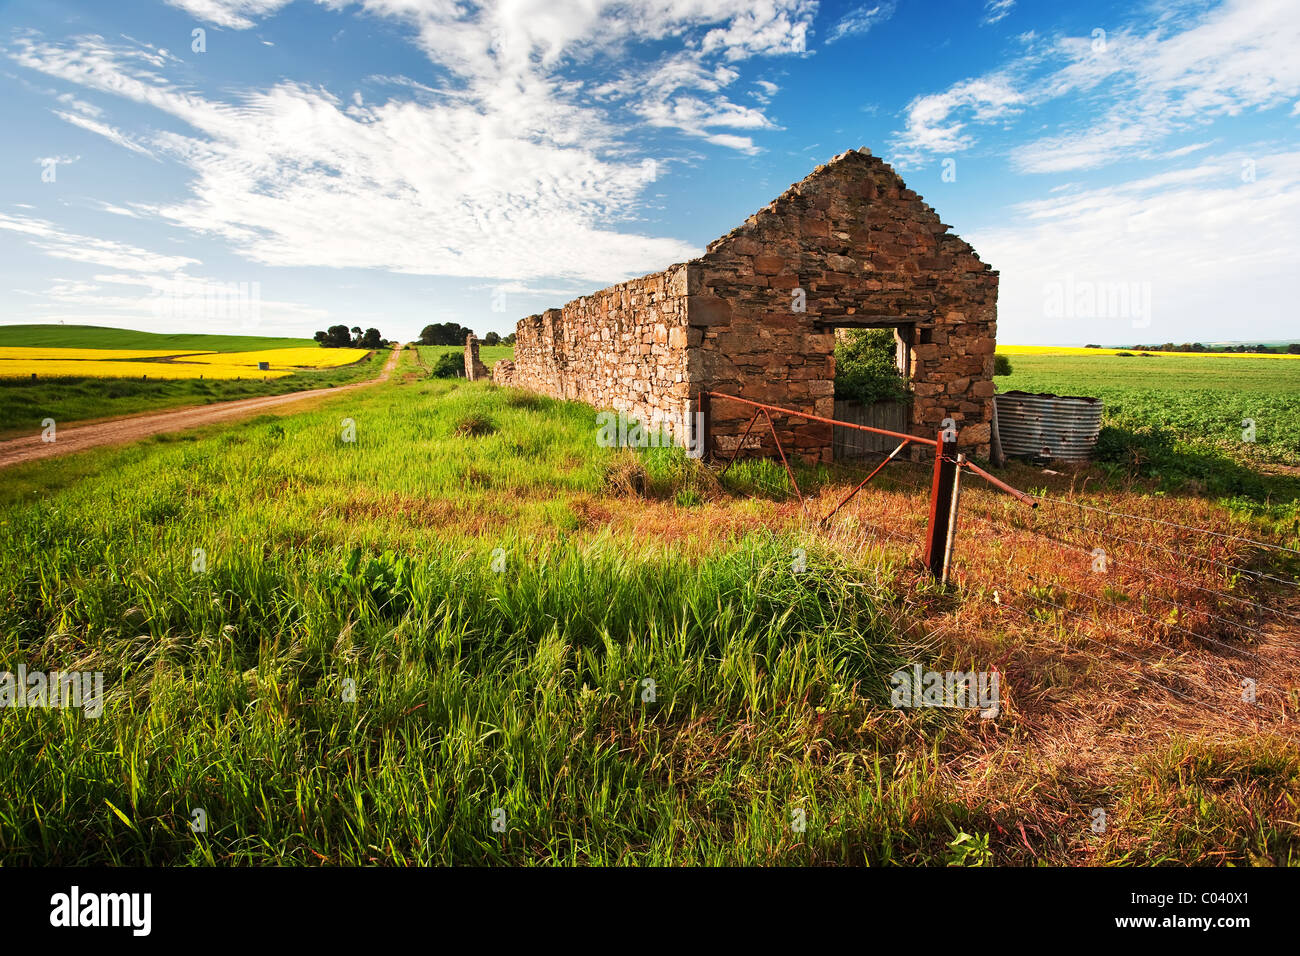 Mid North Canola Fields, South Australia - Stock Image